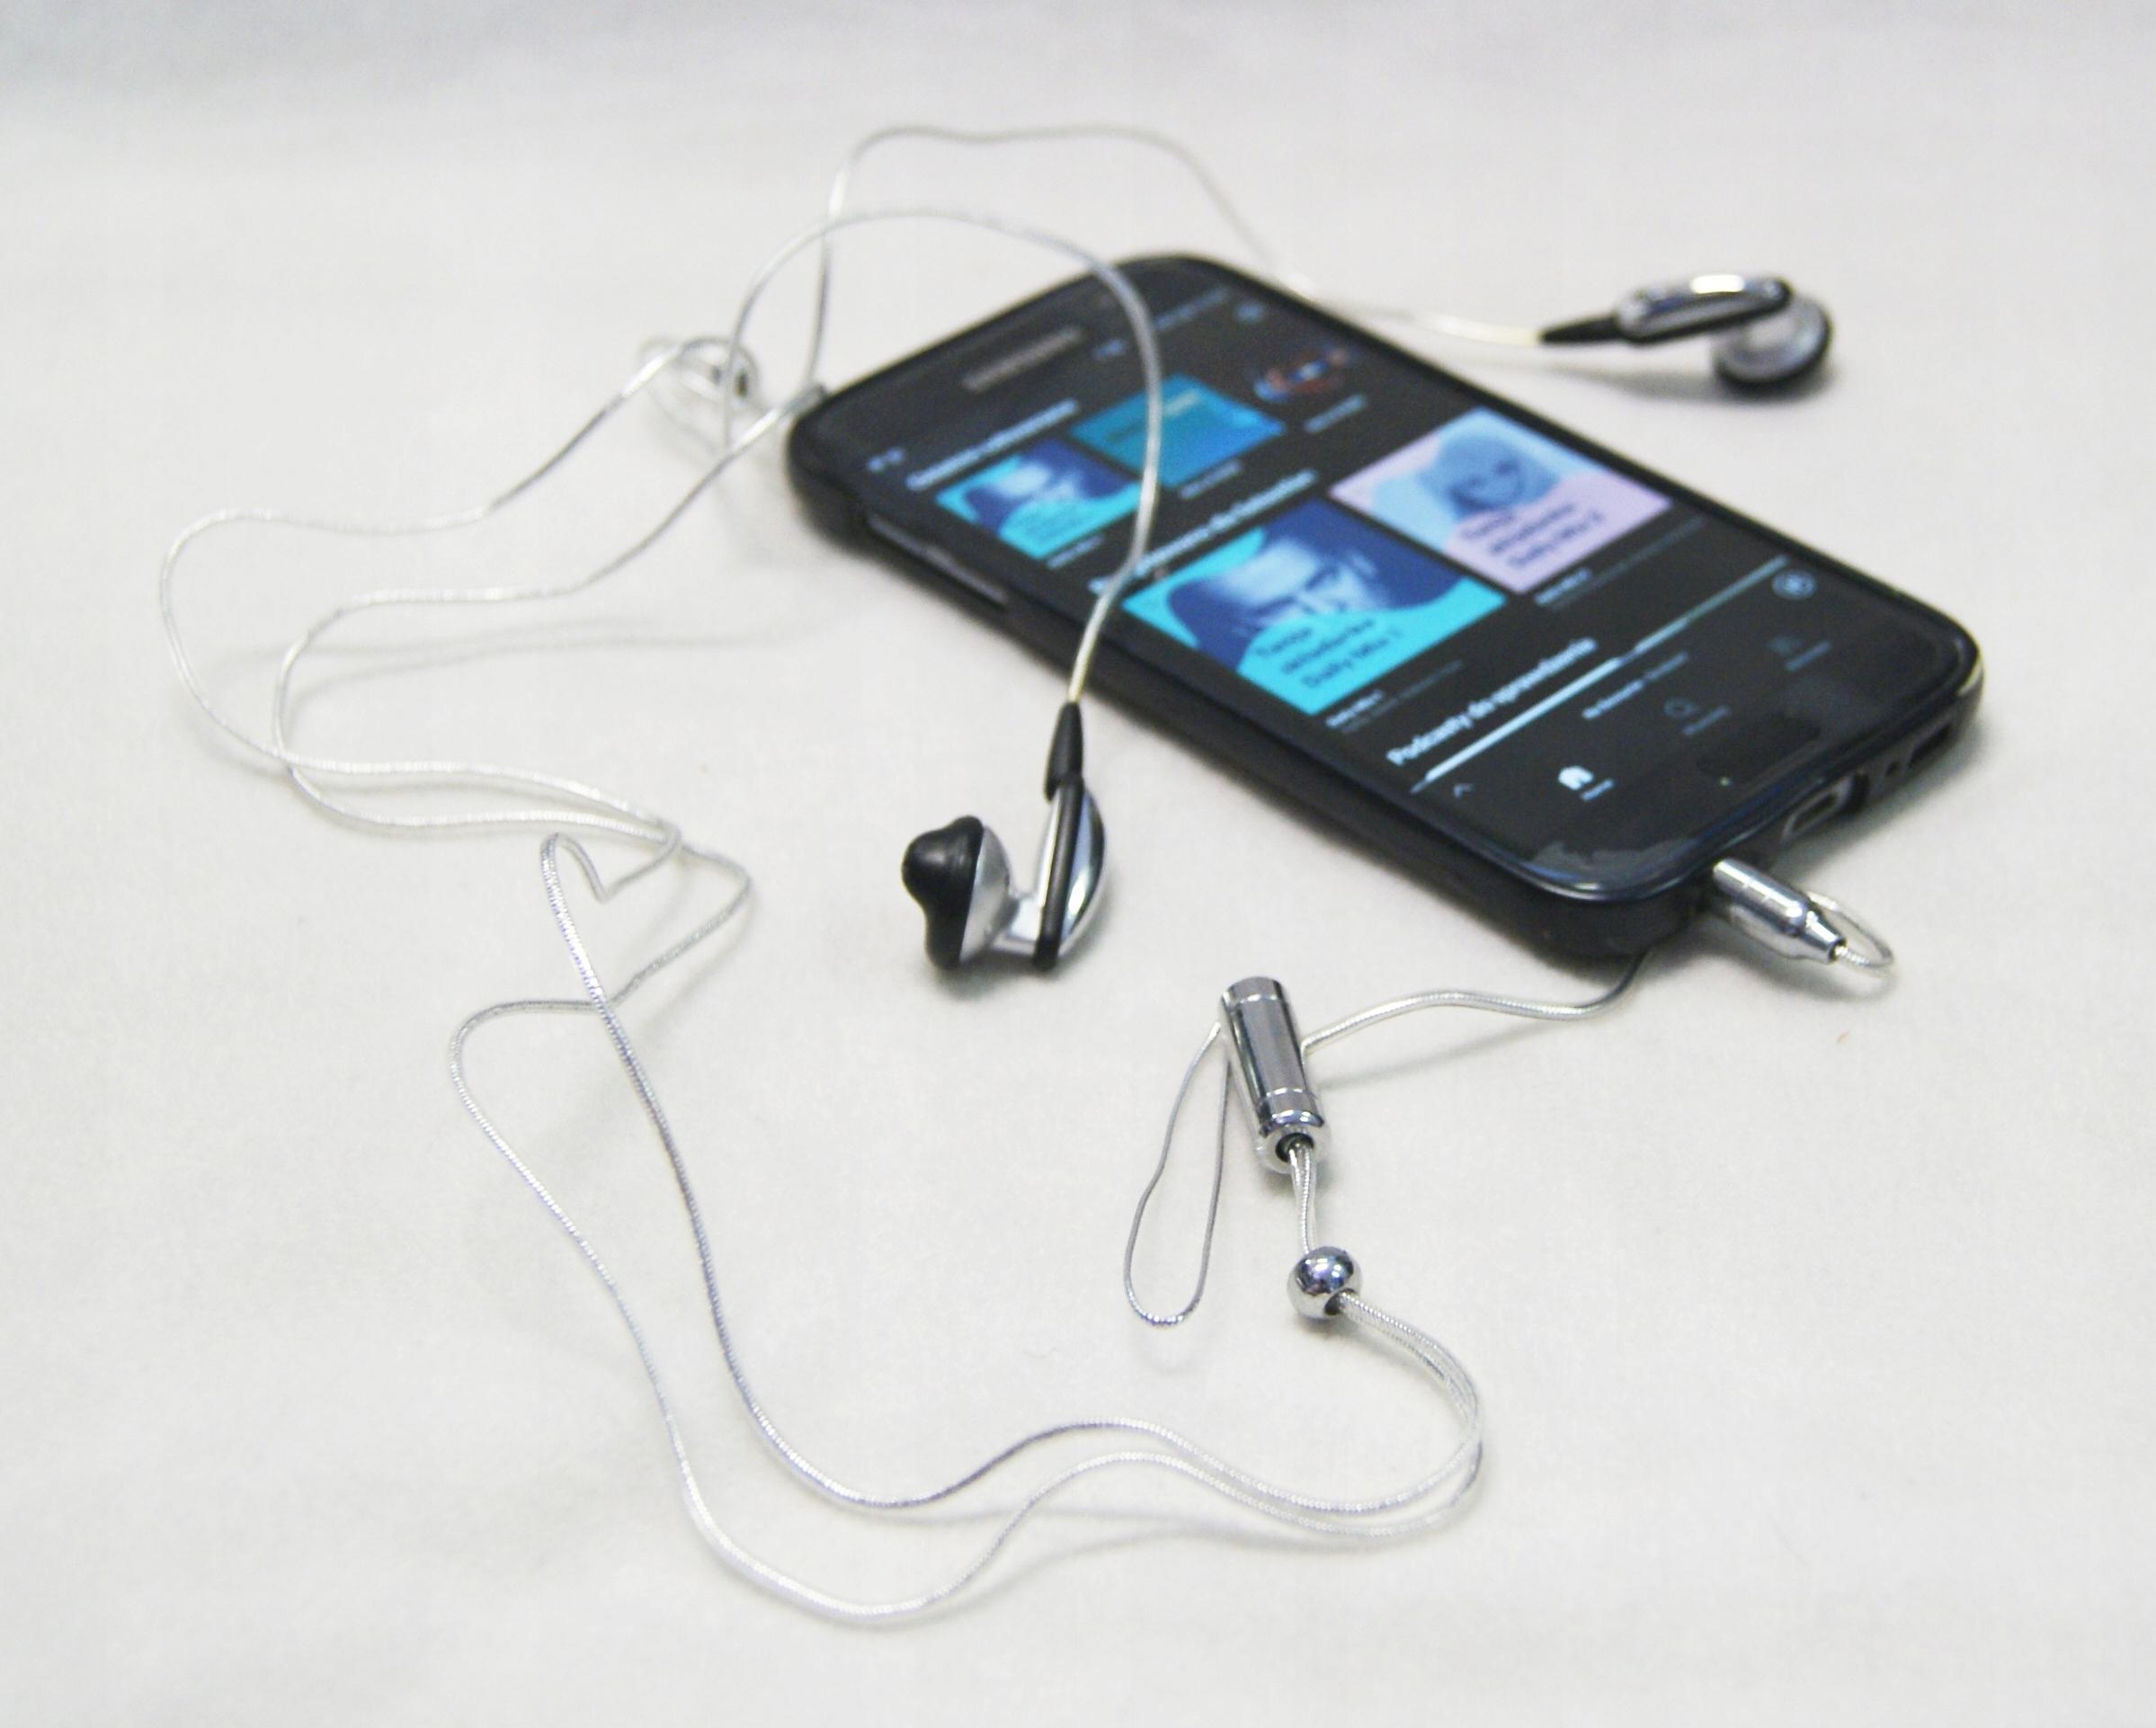 Slúchadlá Platinum E-Chat 1600 Blister 30 kusov